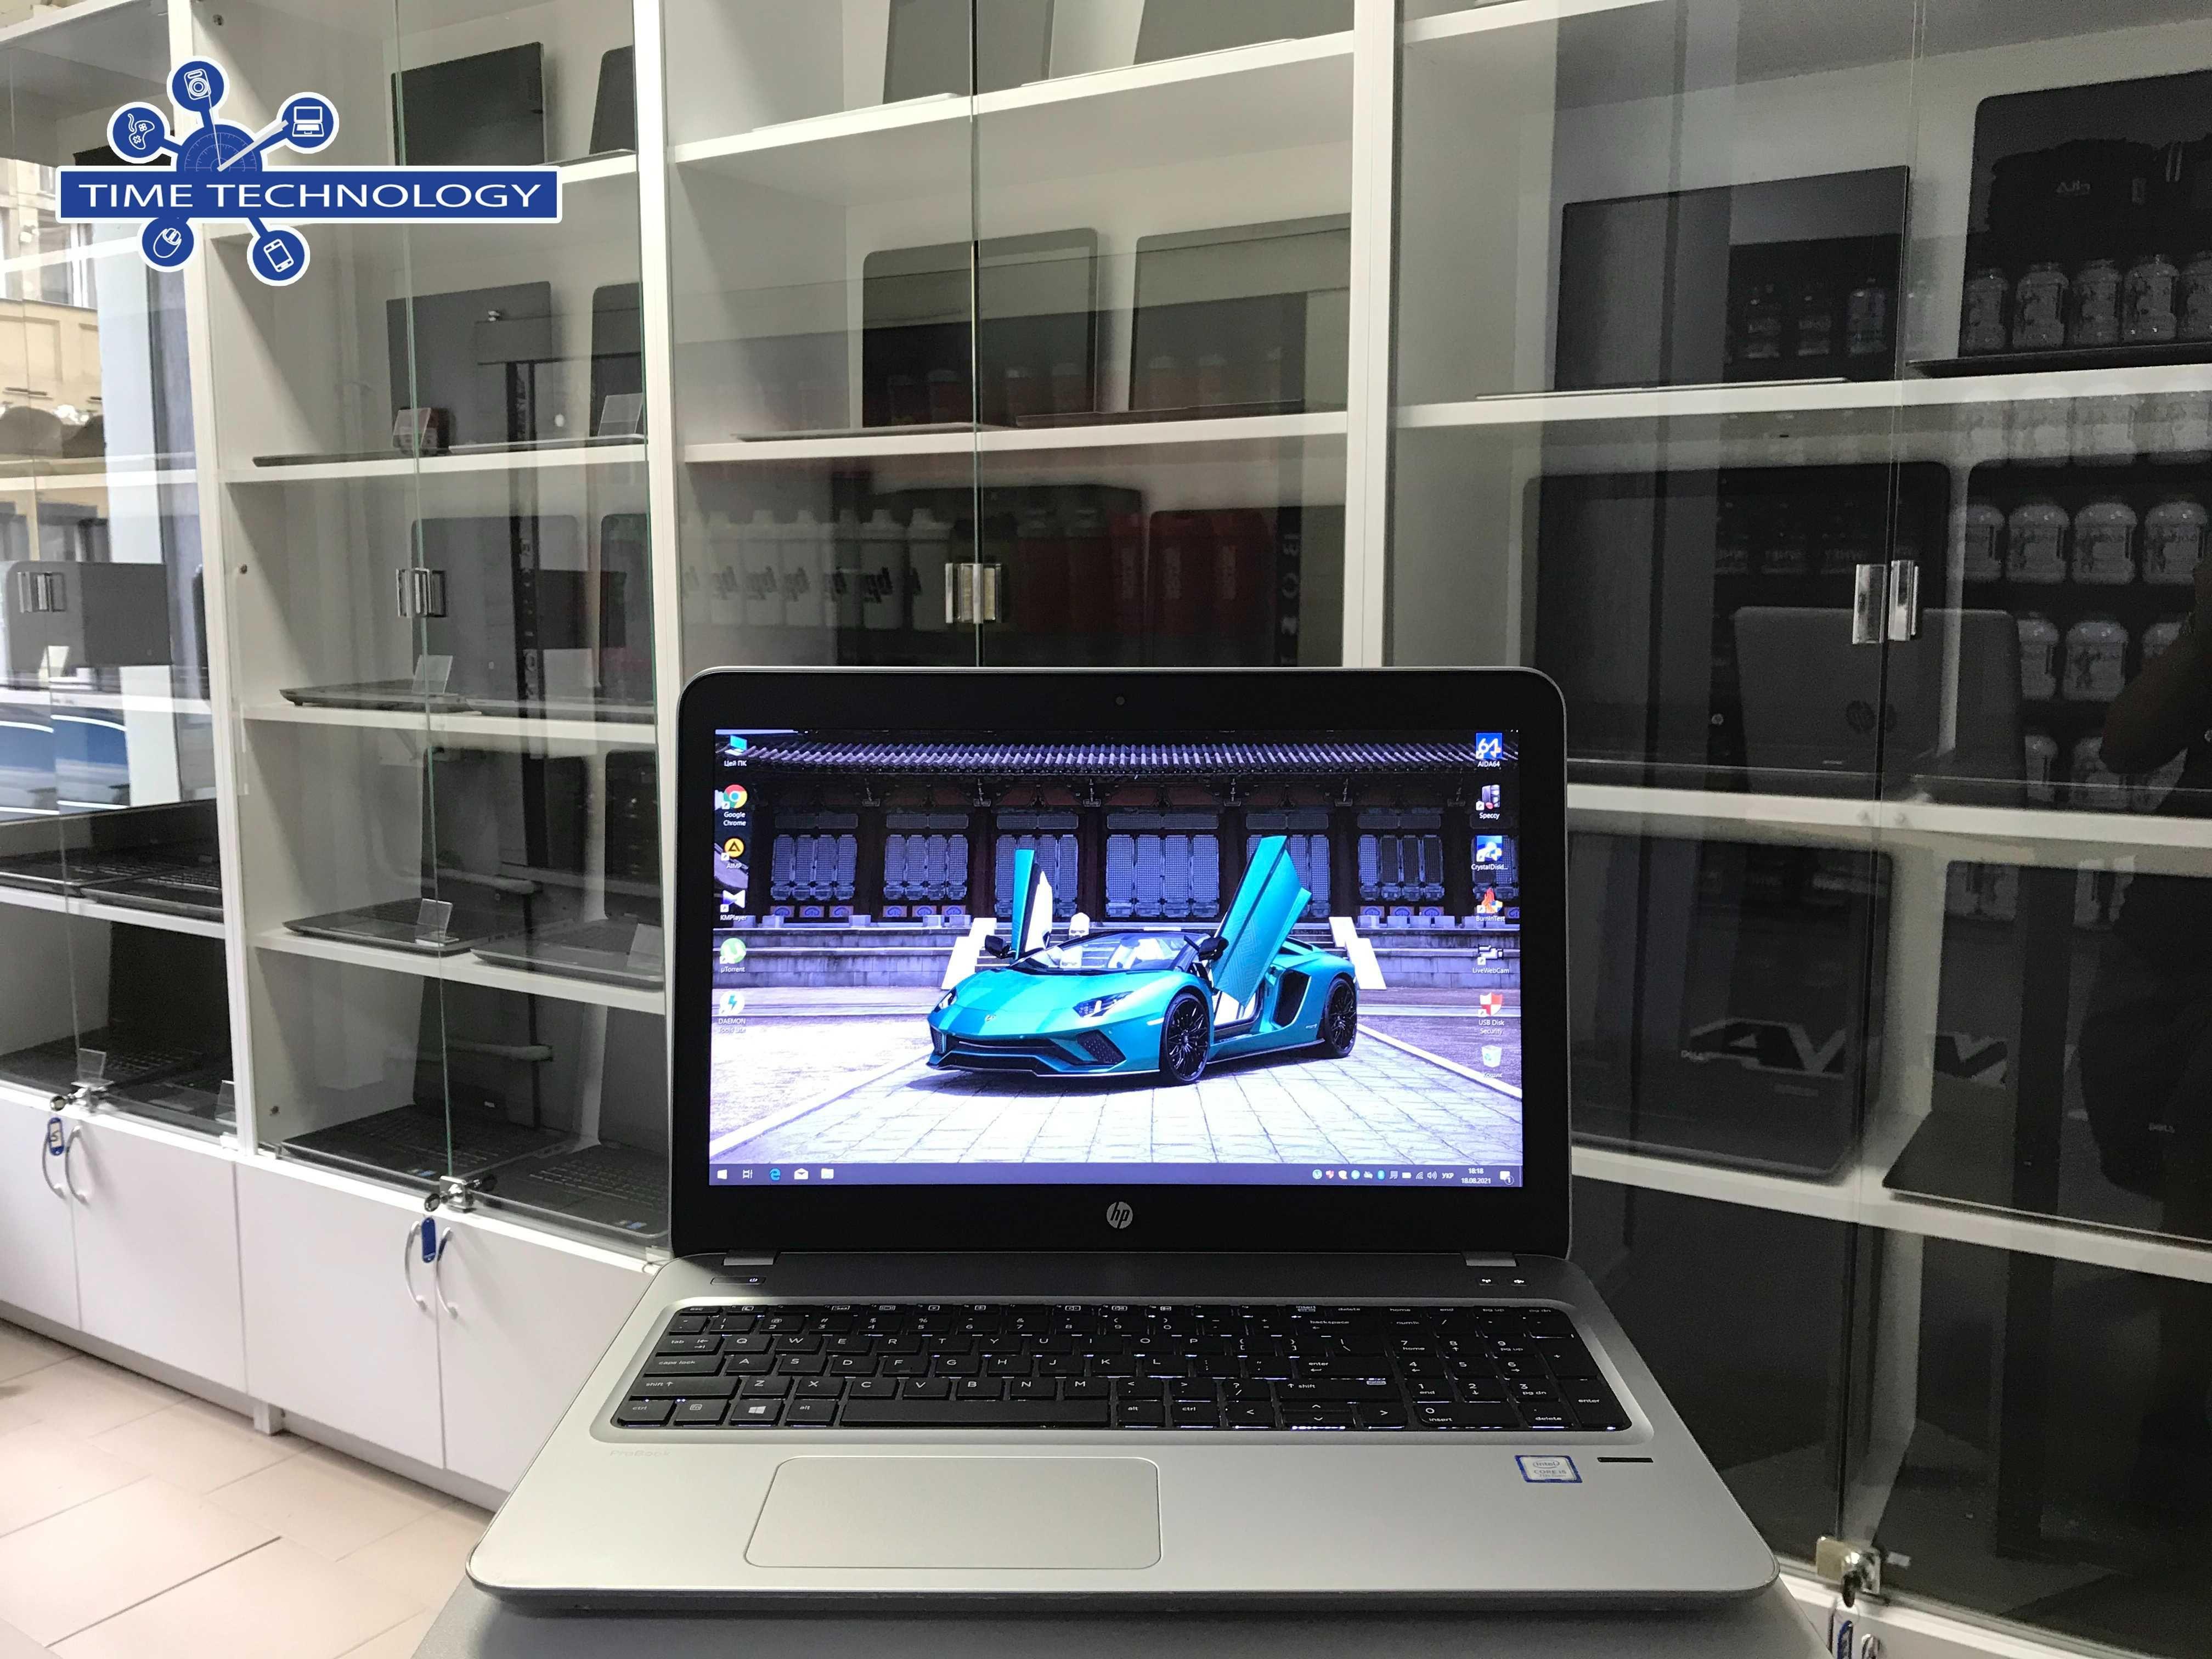 Ноутбук HP Probook 450 G4 [Core i5-7gen] [FULL] [SSD] R8 Куліша 22